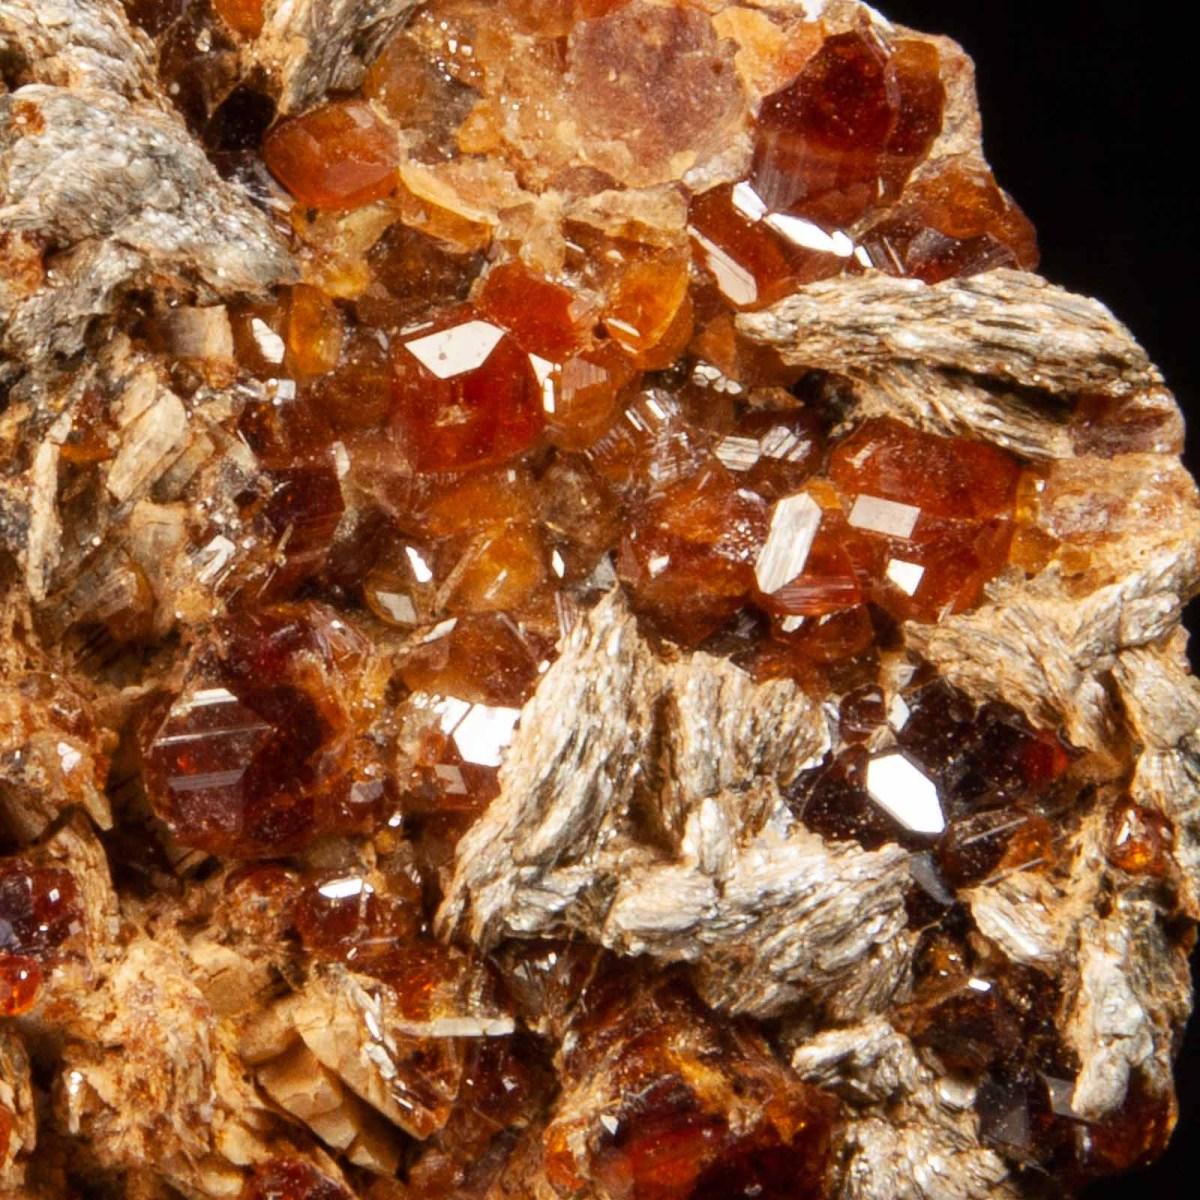 Hessonite Garnets and Chlinoclore